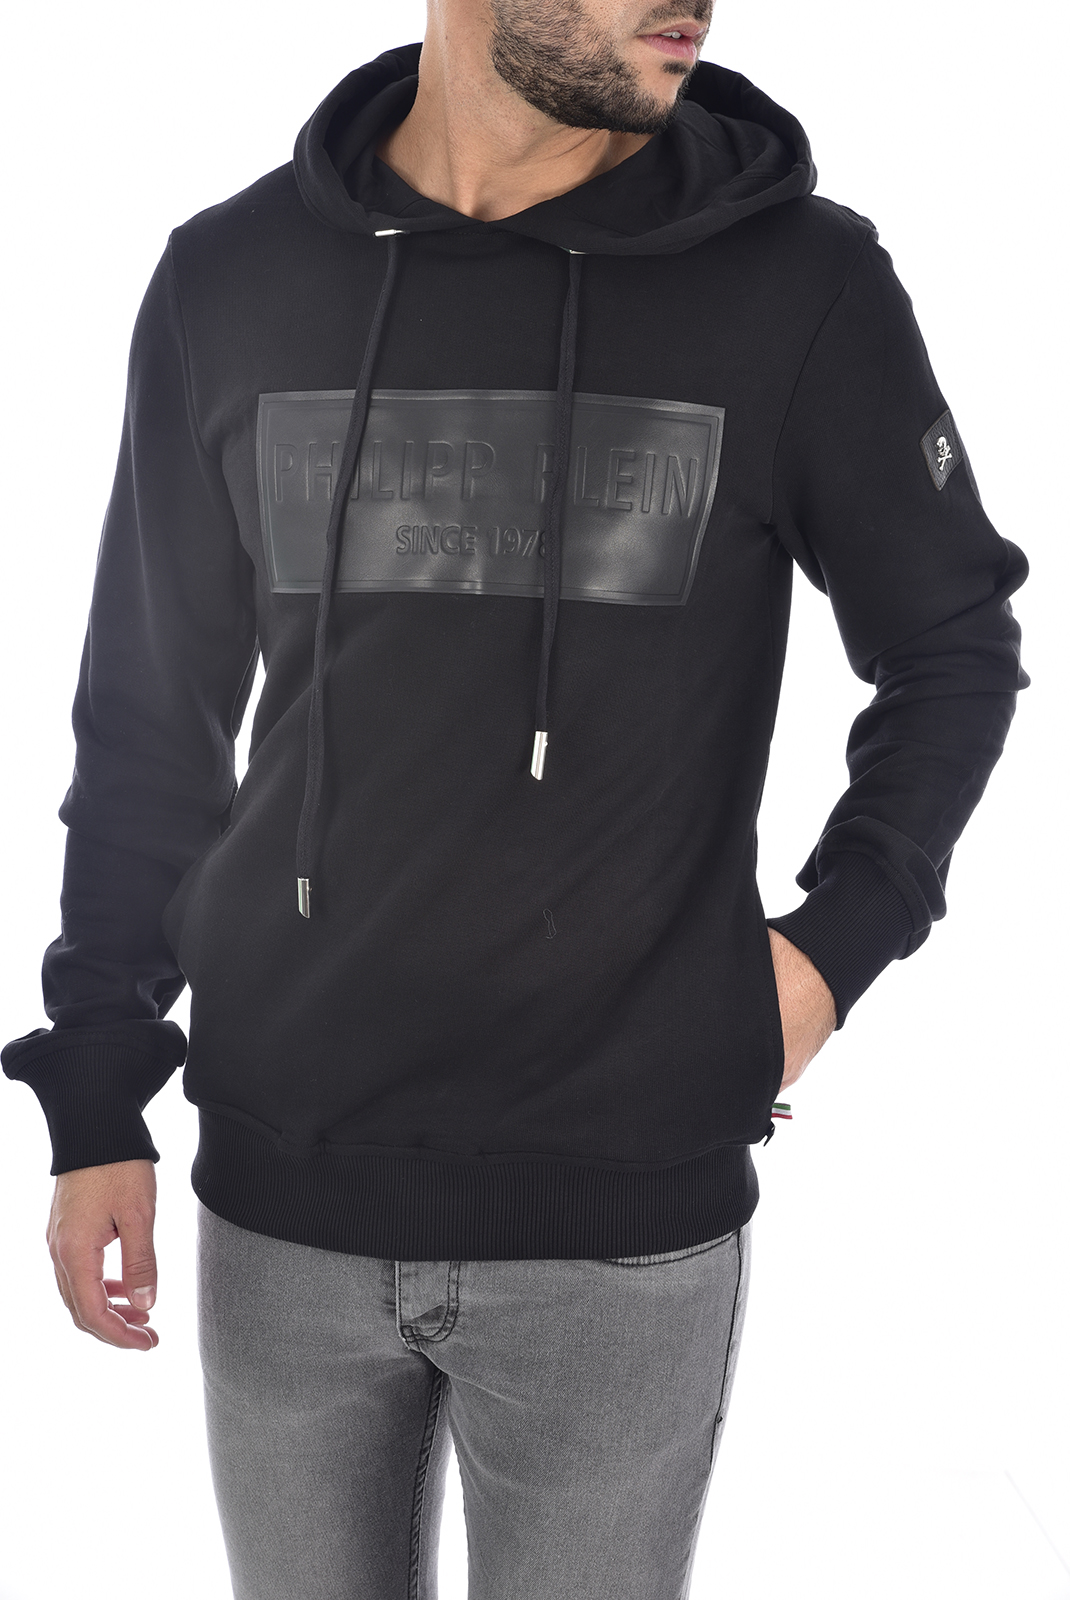 Sweatshirts  Philipp plein MJB0169 ALAN NOIR